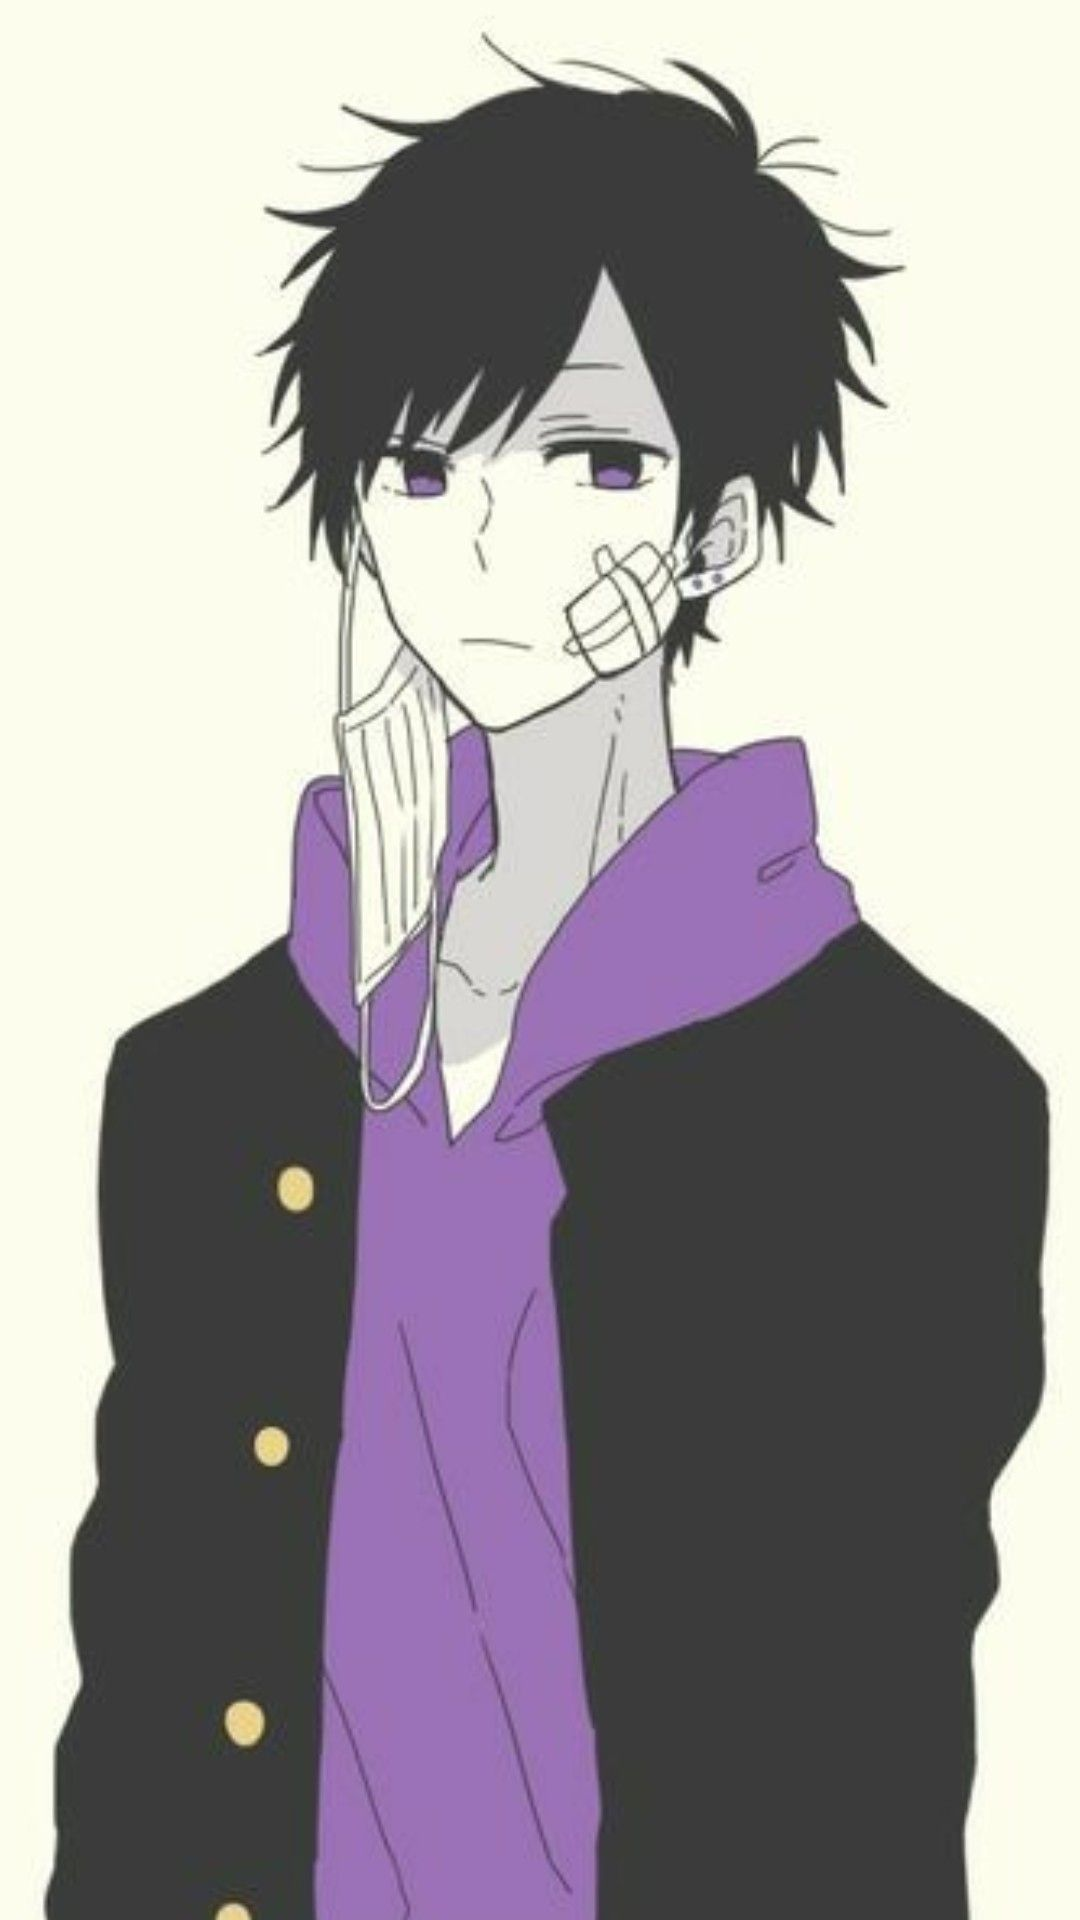 Pin By Eme Pessoa On 2d Boys 3 Anime Anime Drawings Boy Anime Boy Sketch